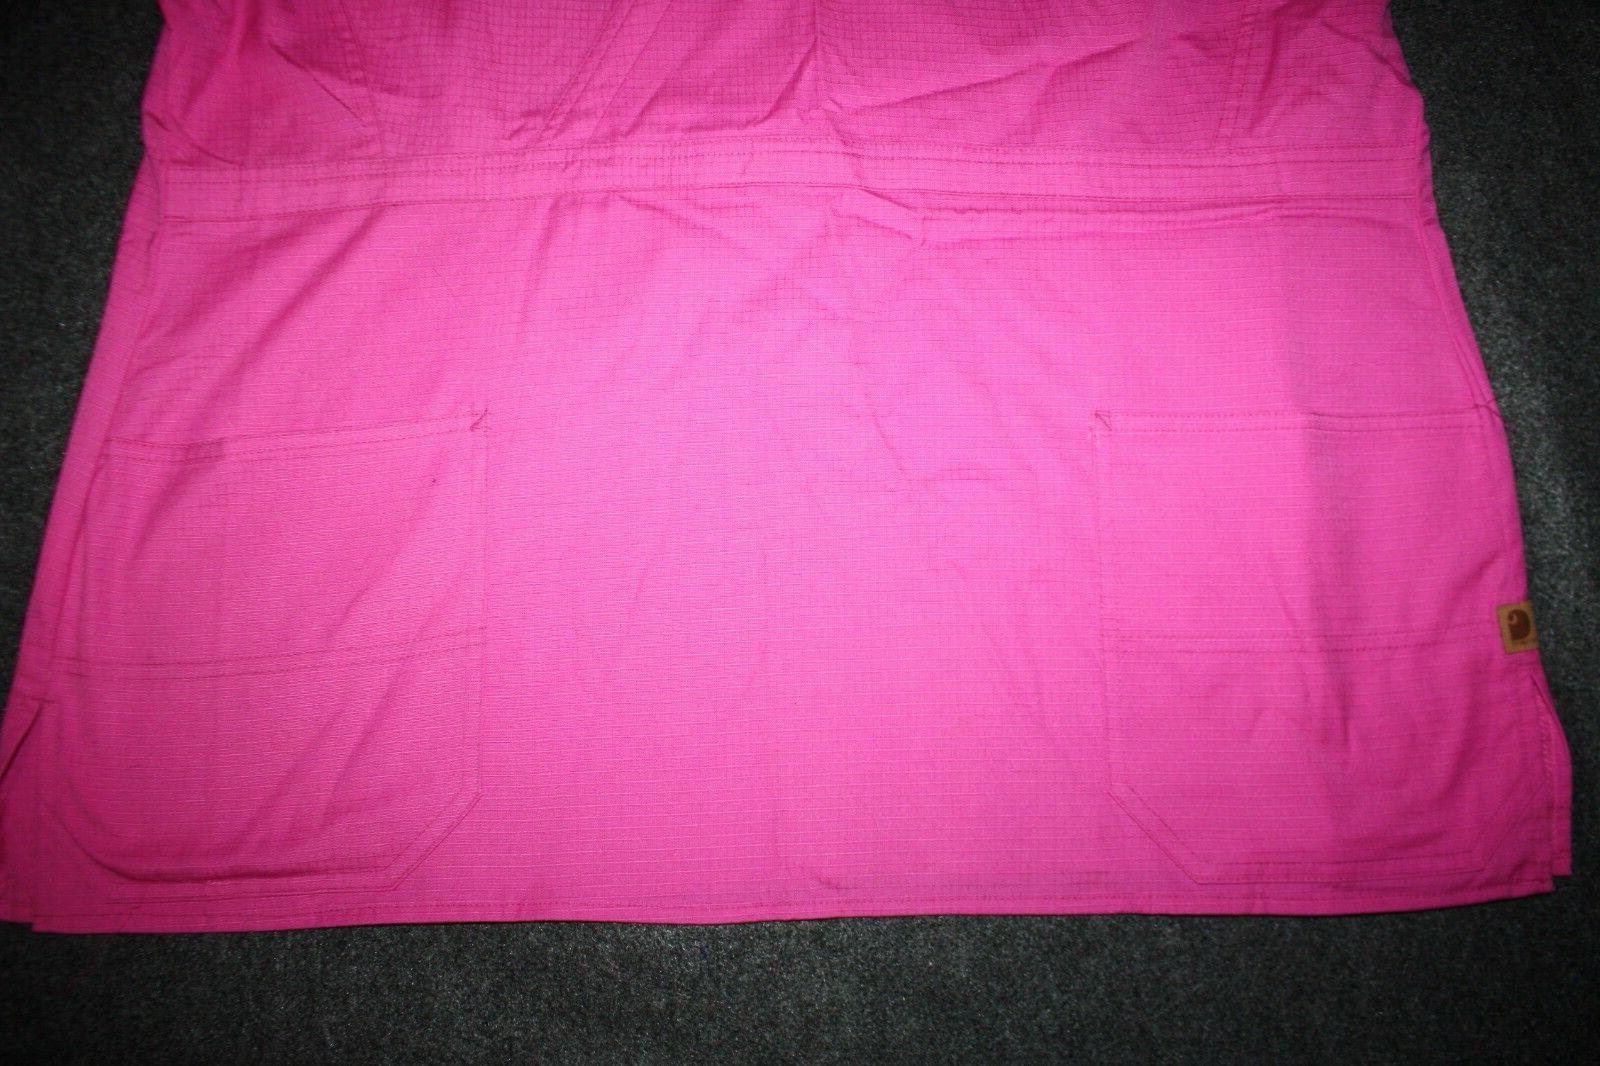 Carhartt Womens Medical Set Ripstop 2 Pink Plus Size